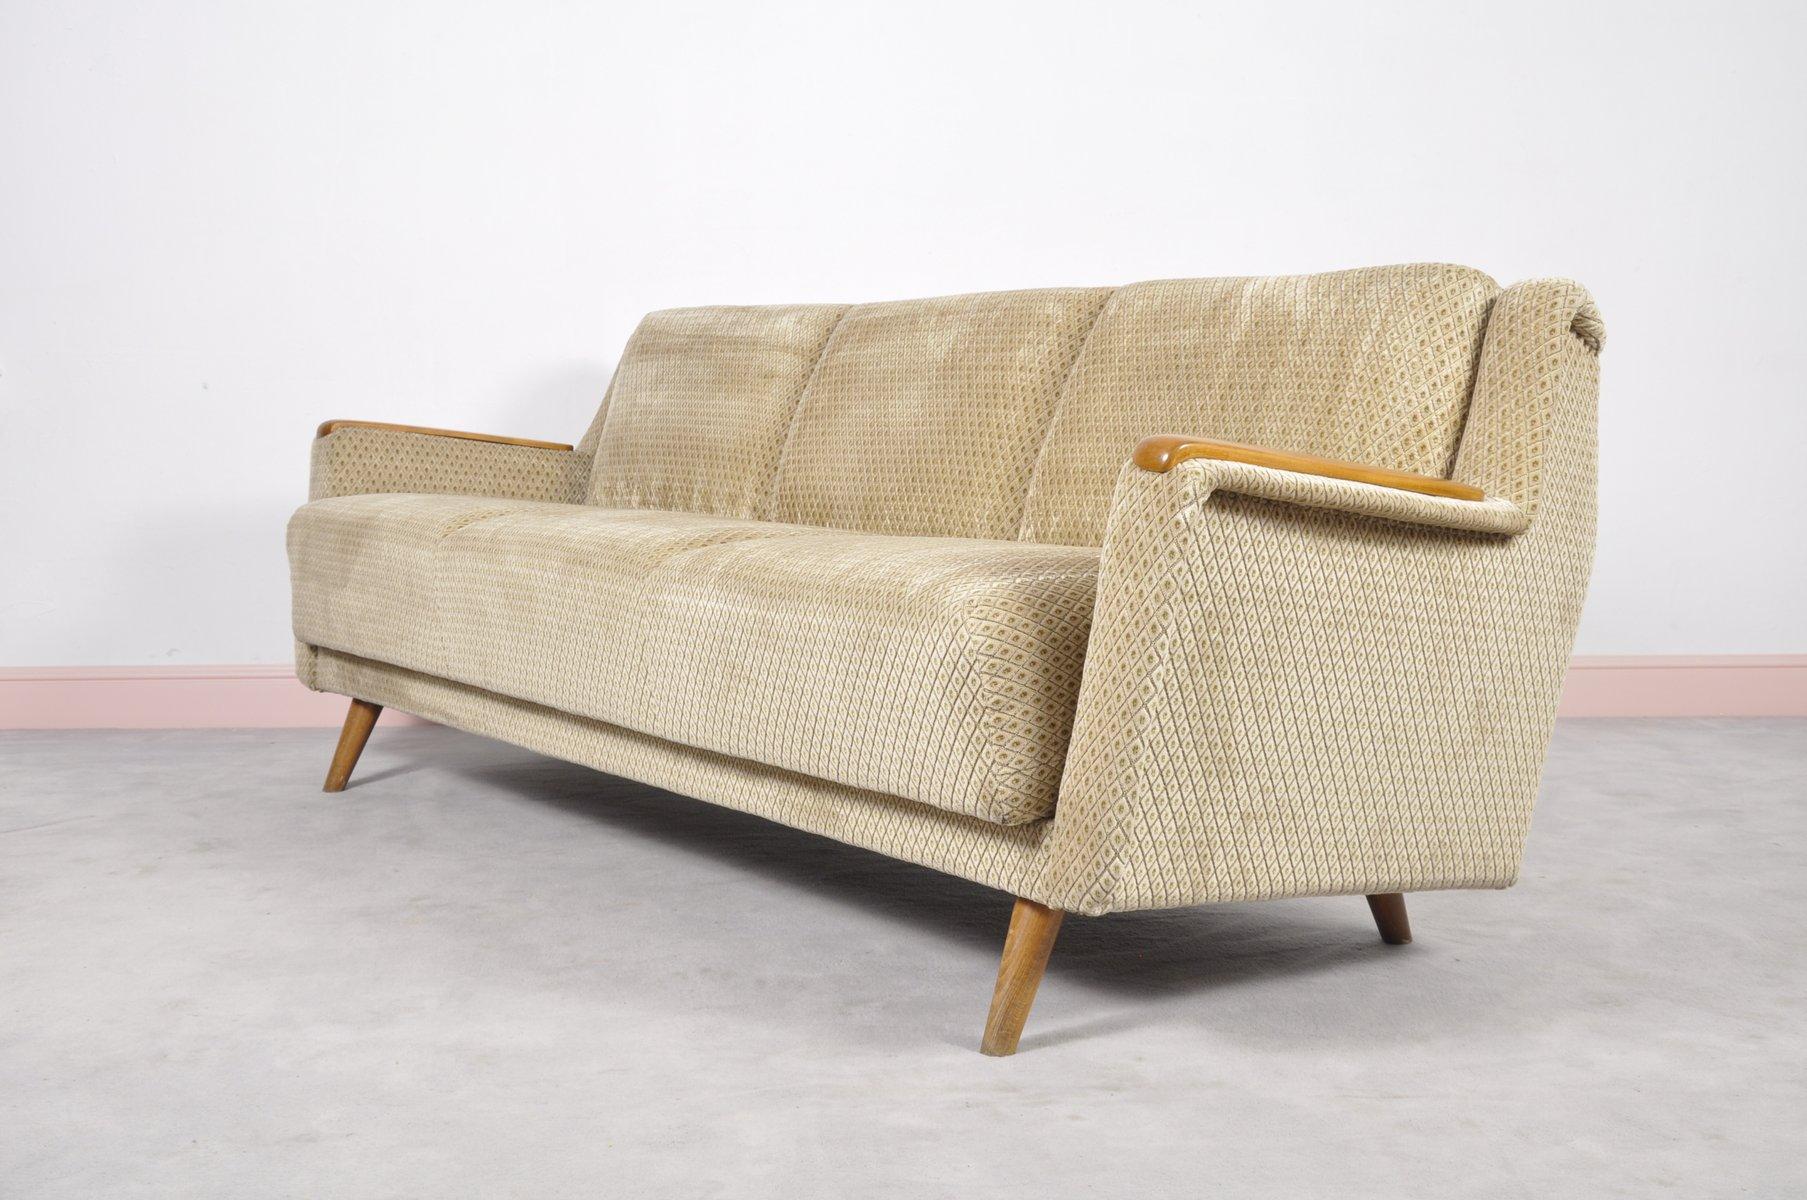 Dsc hong kong sofa bed home for Cheap designer furniture hong kong